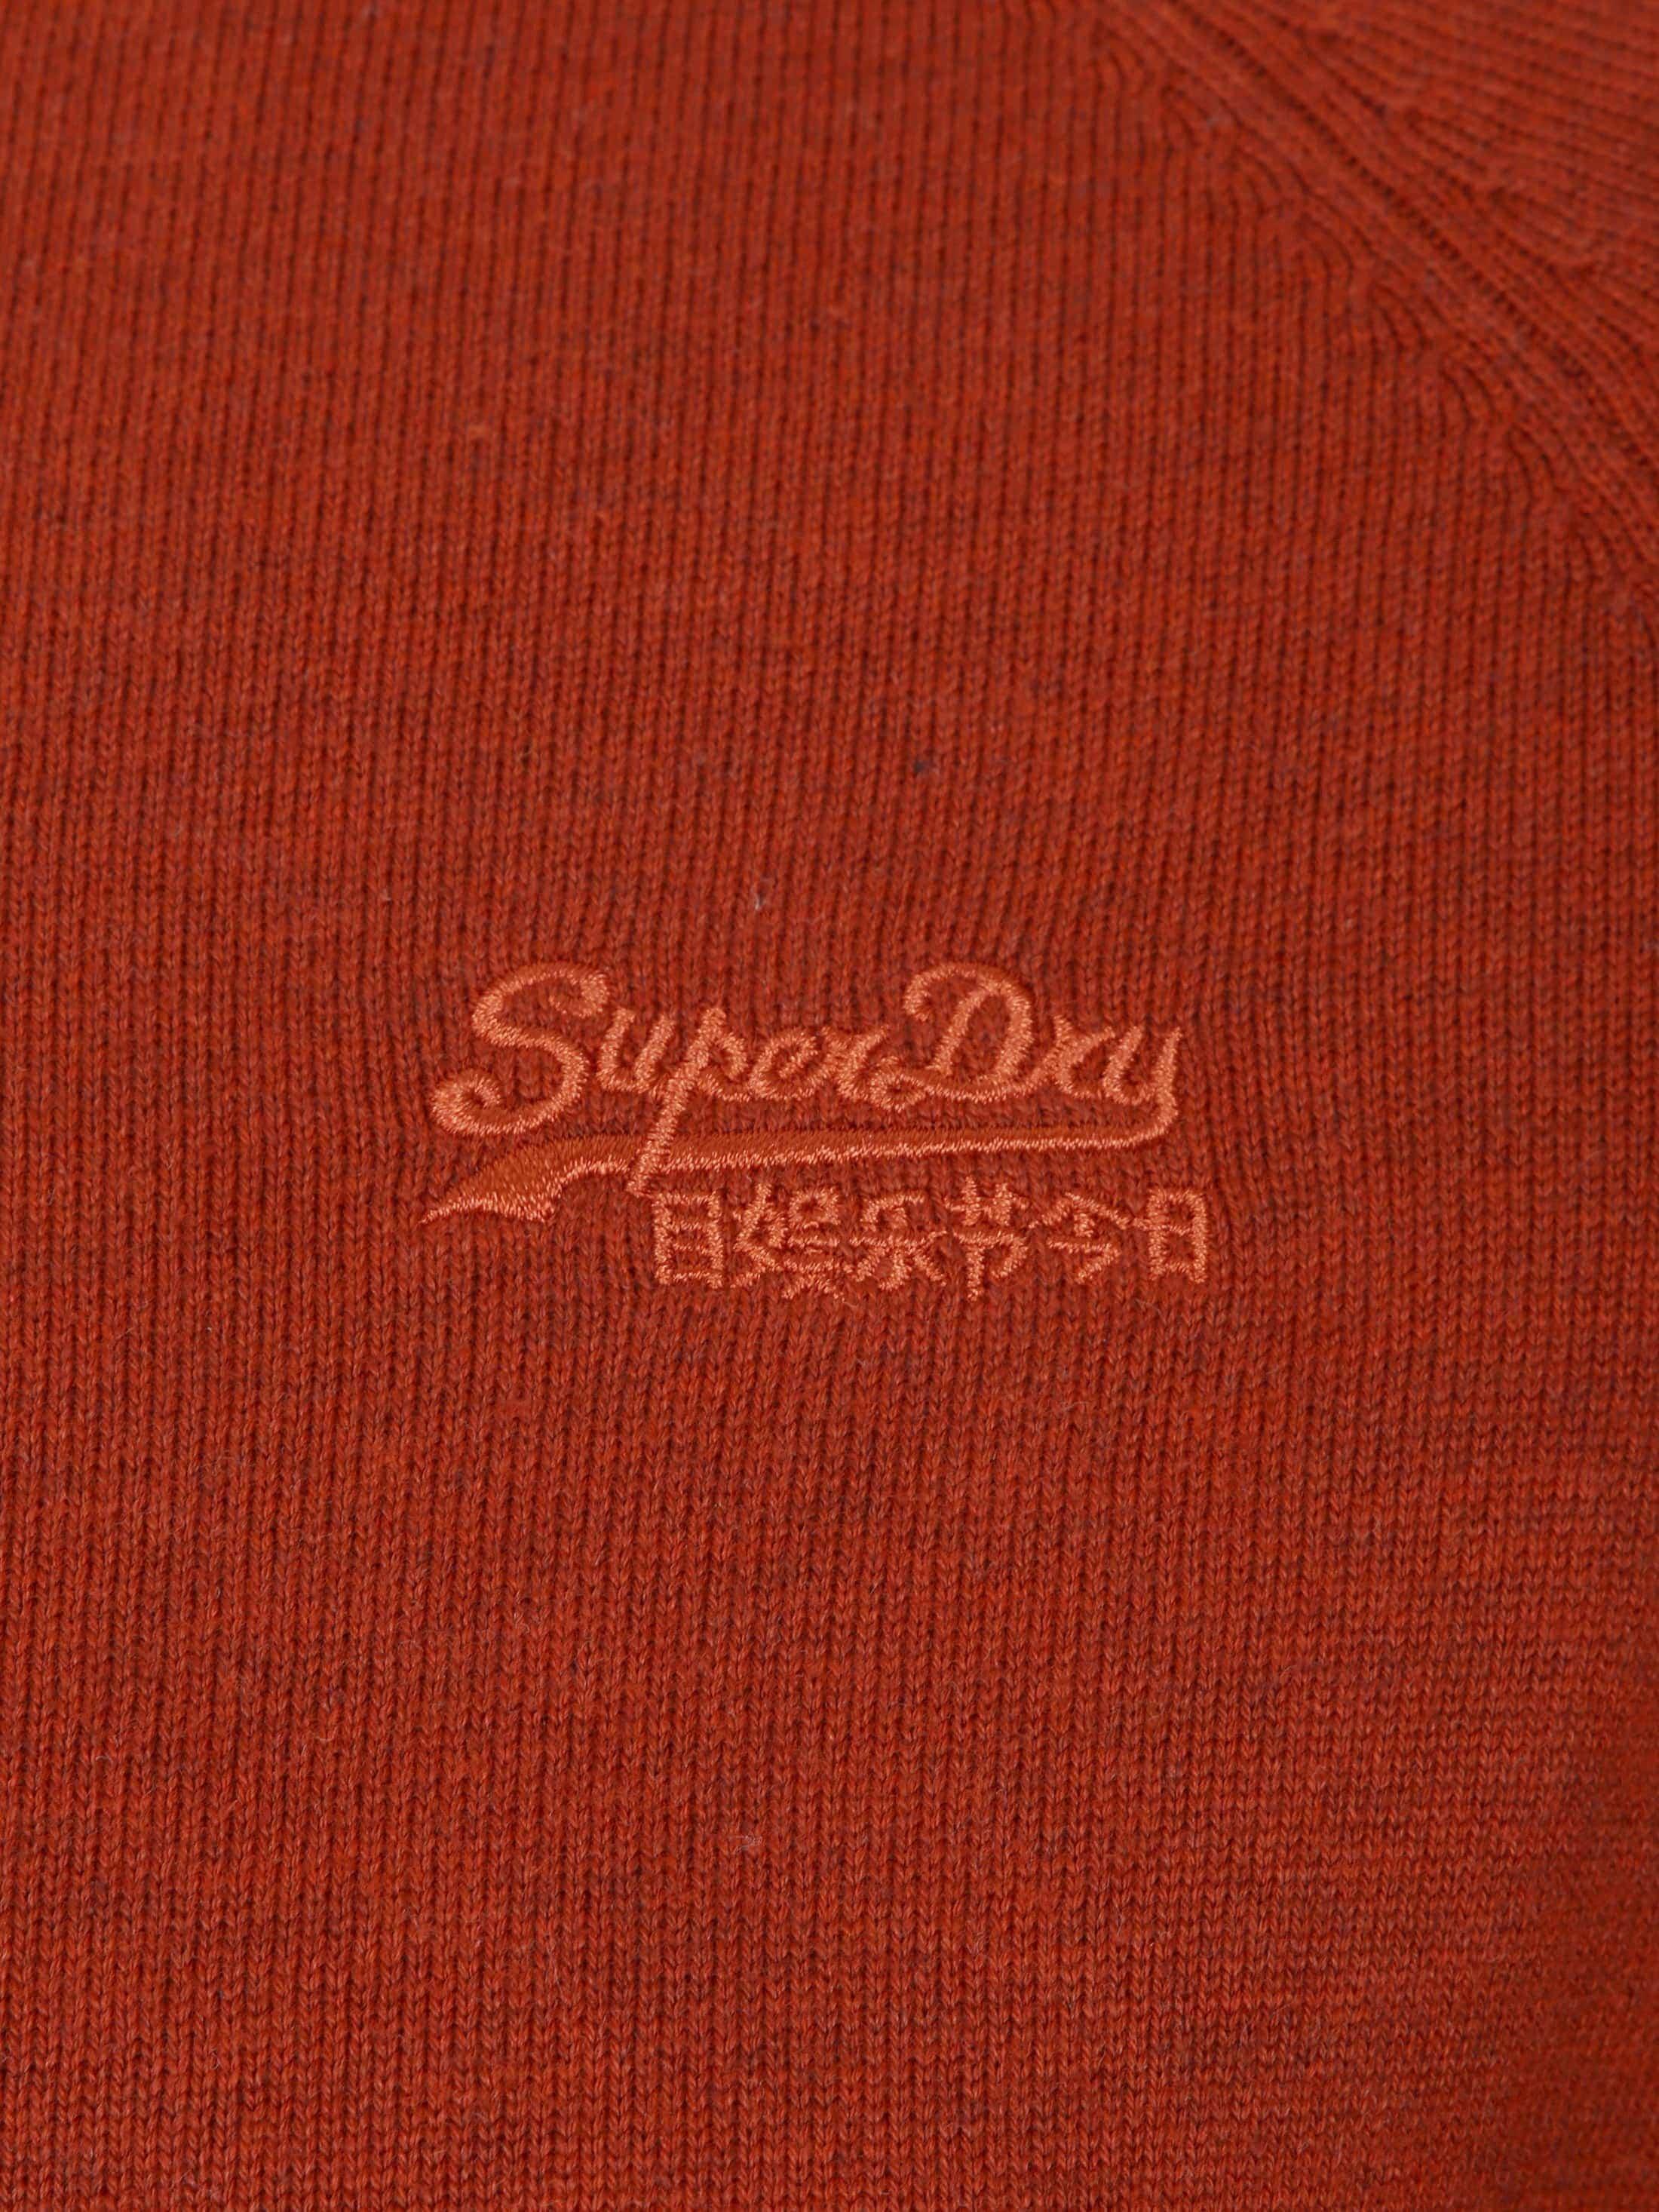 Superdry Sweater Melange Rood Oranje foto 1